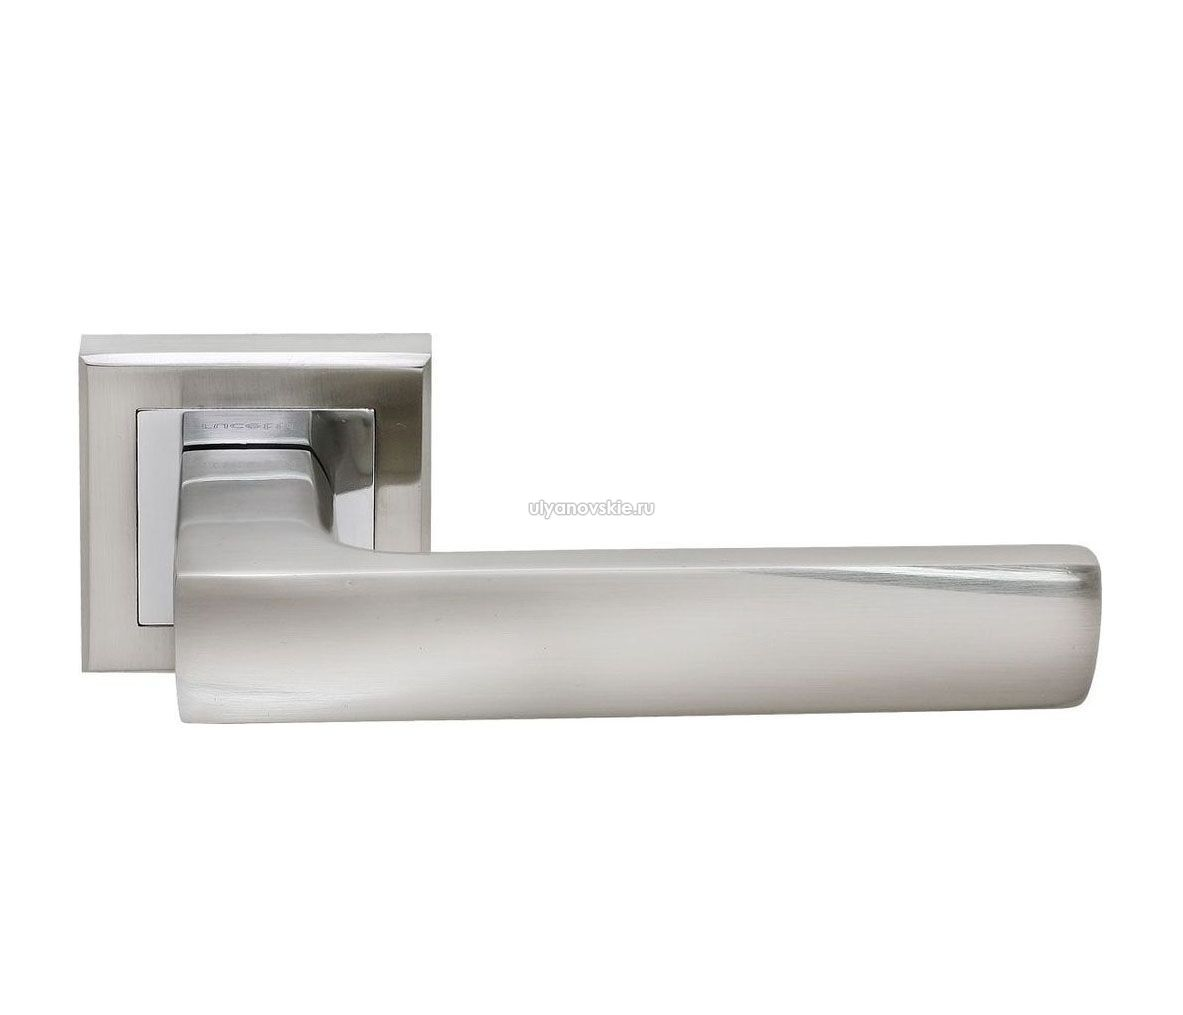 Ручка Rucetti RAP 14-S SN/CP Белый никель/хром